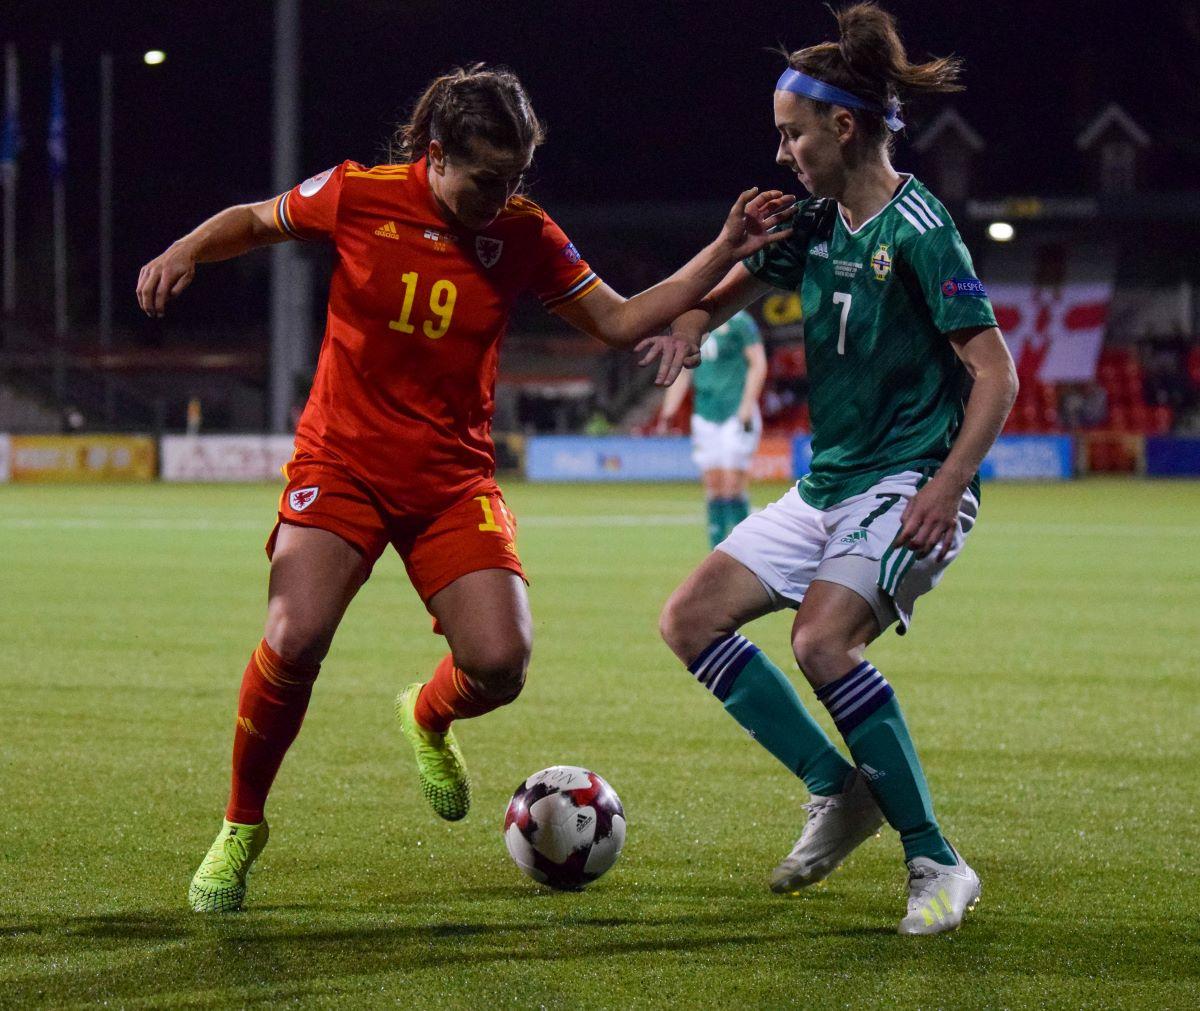 Northern Ireland's Chloe McCarron